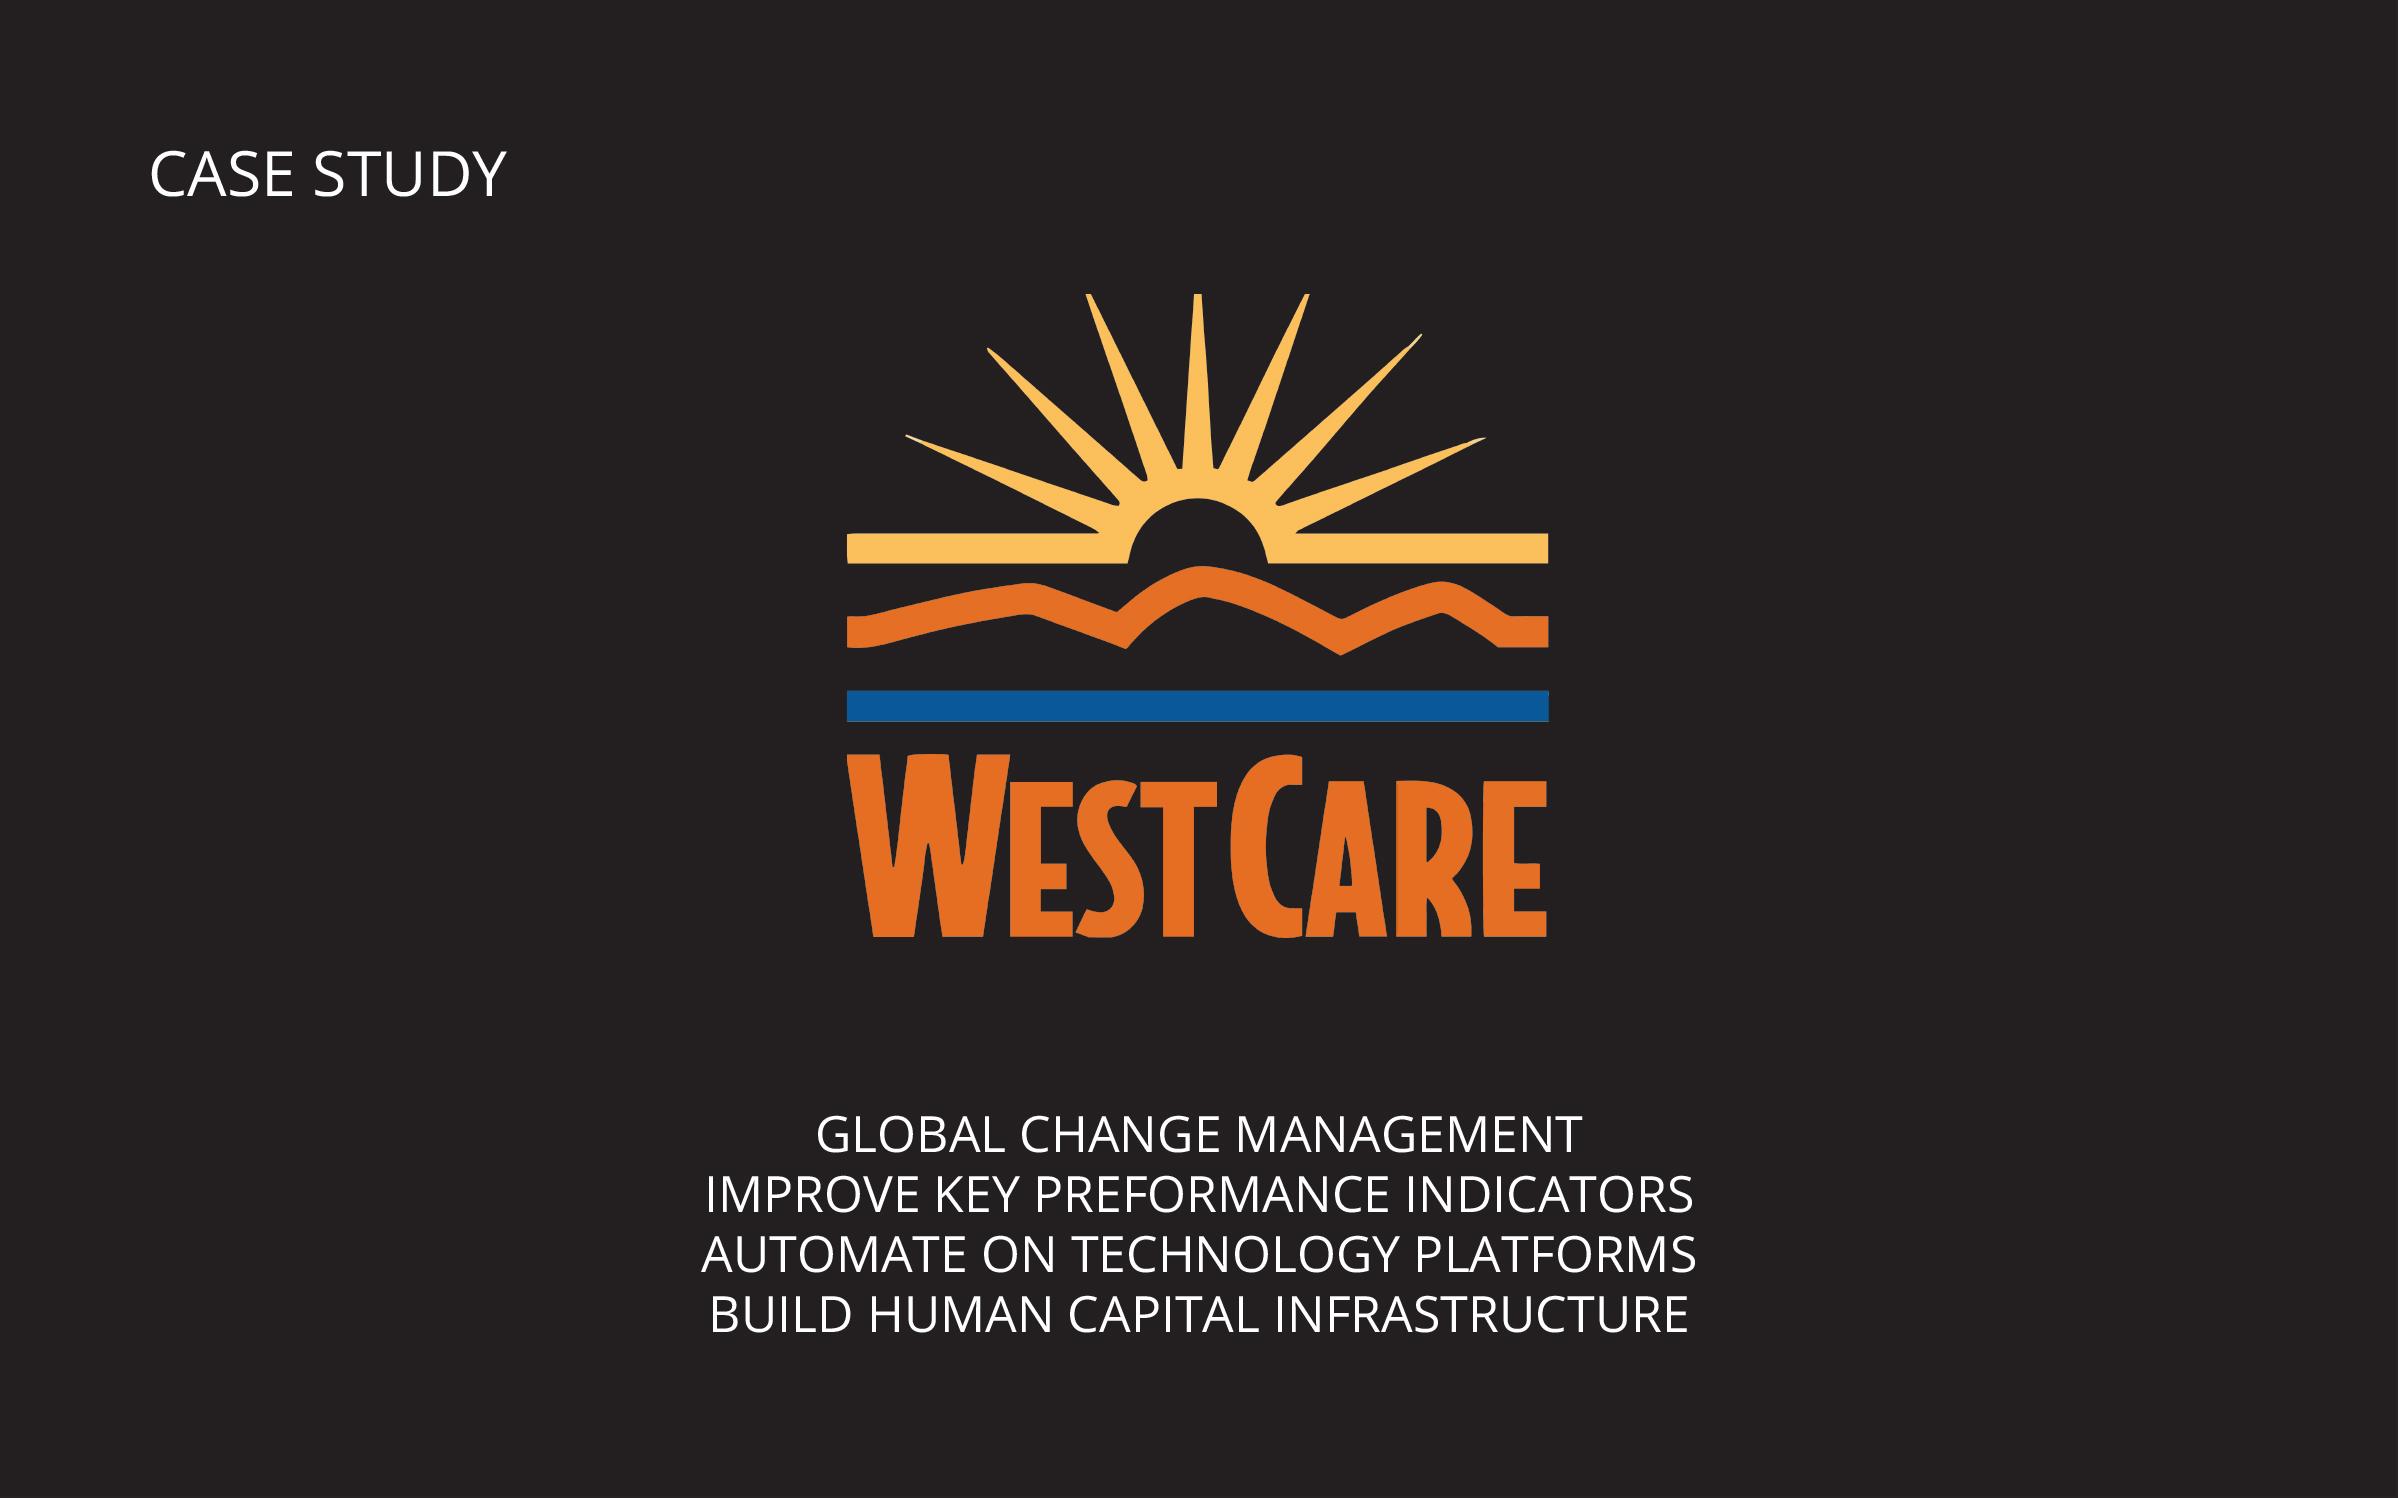 Westcare.jpg